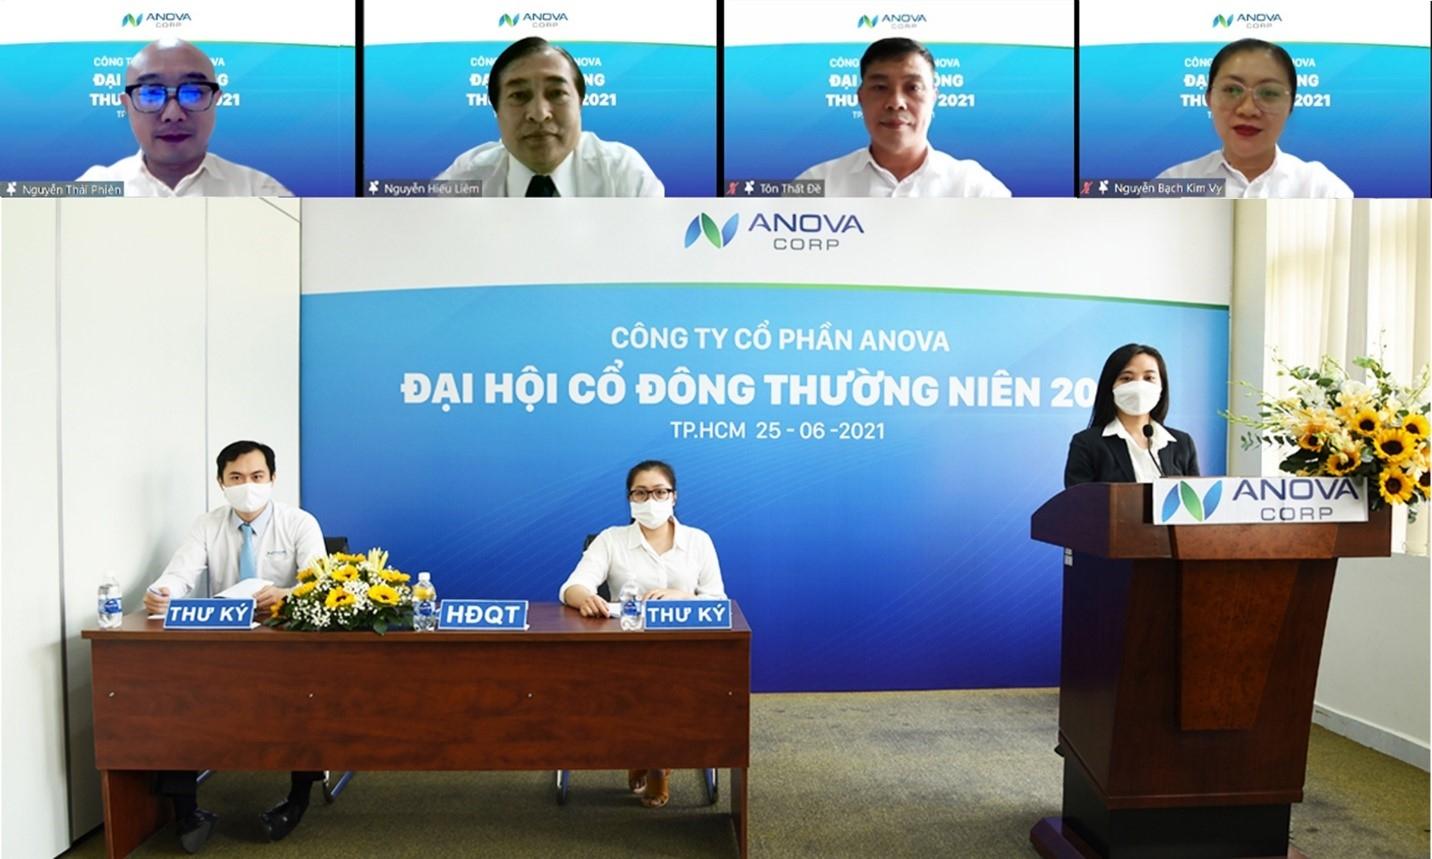 Anova Corp changes name to Nova Consumer Group